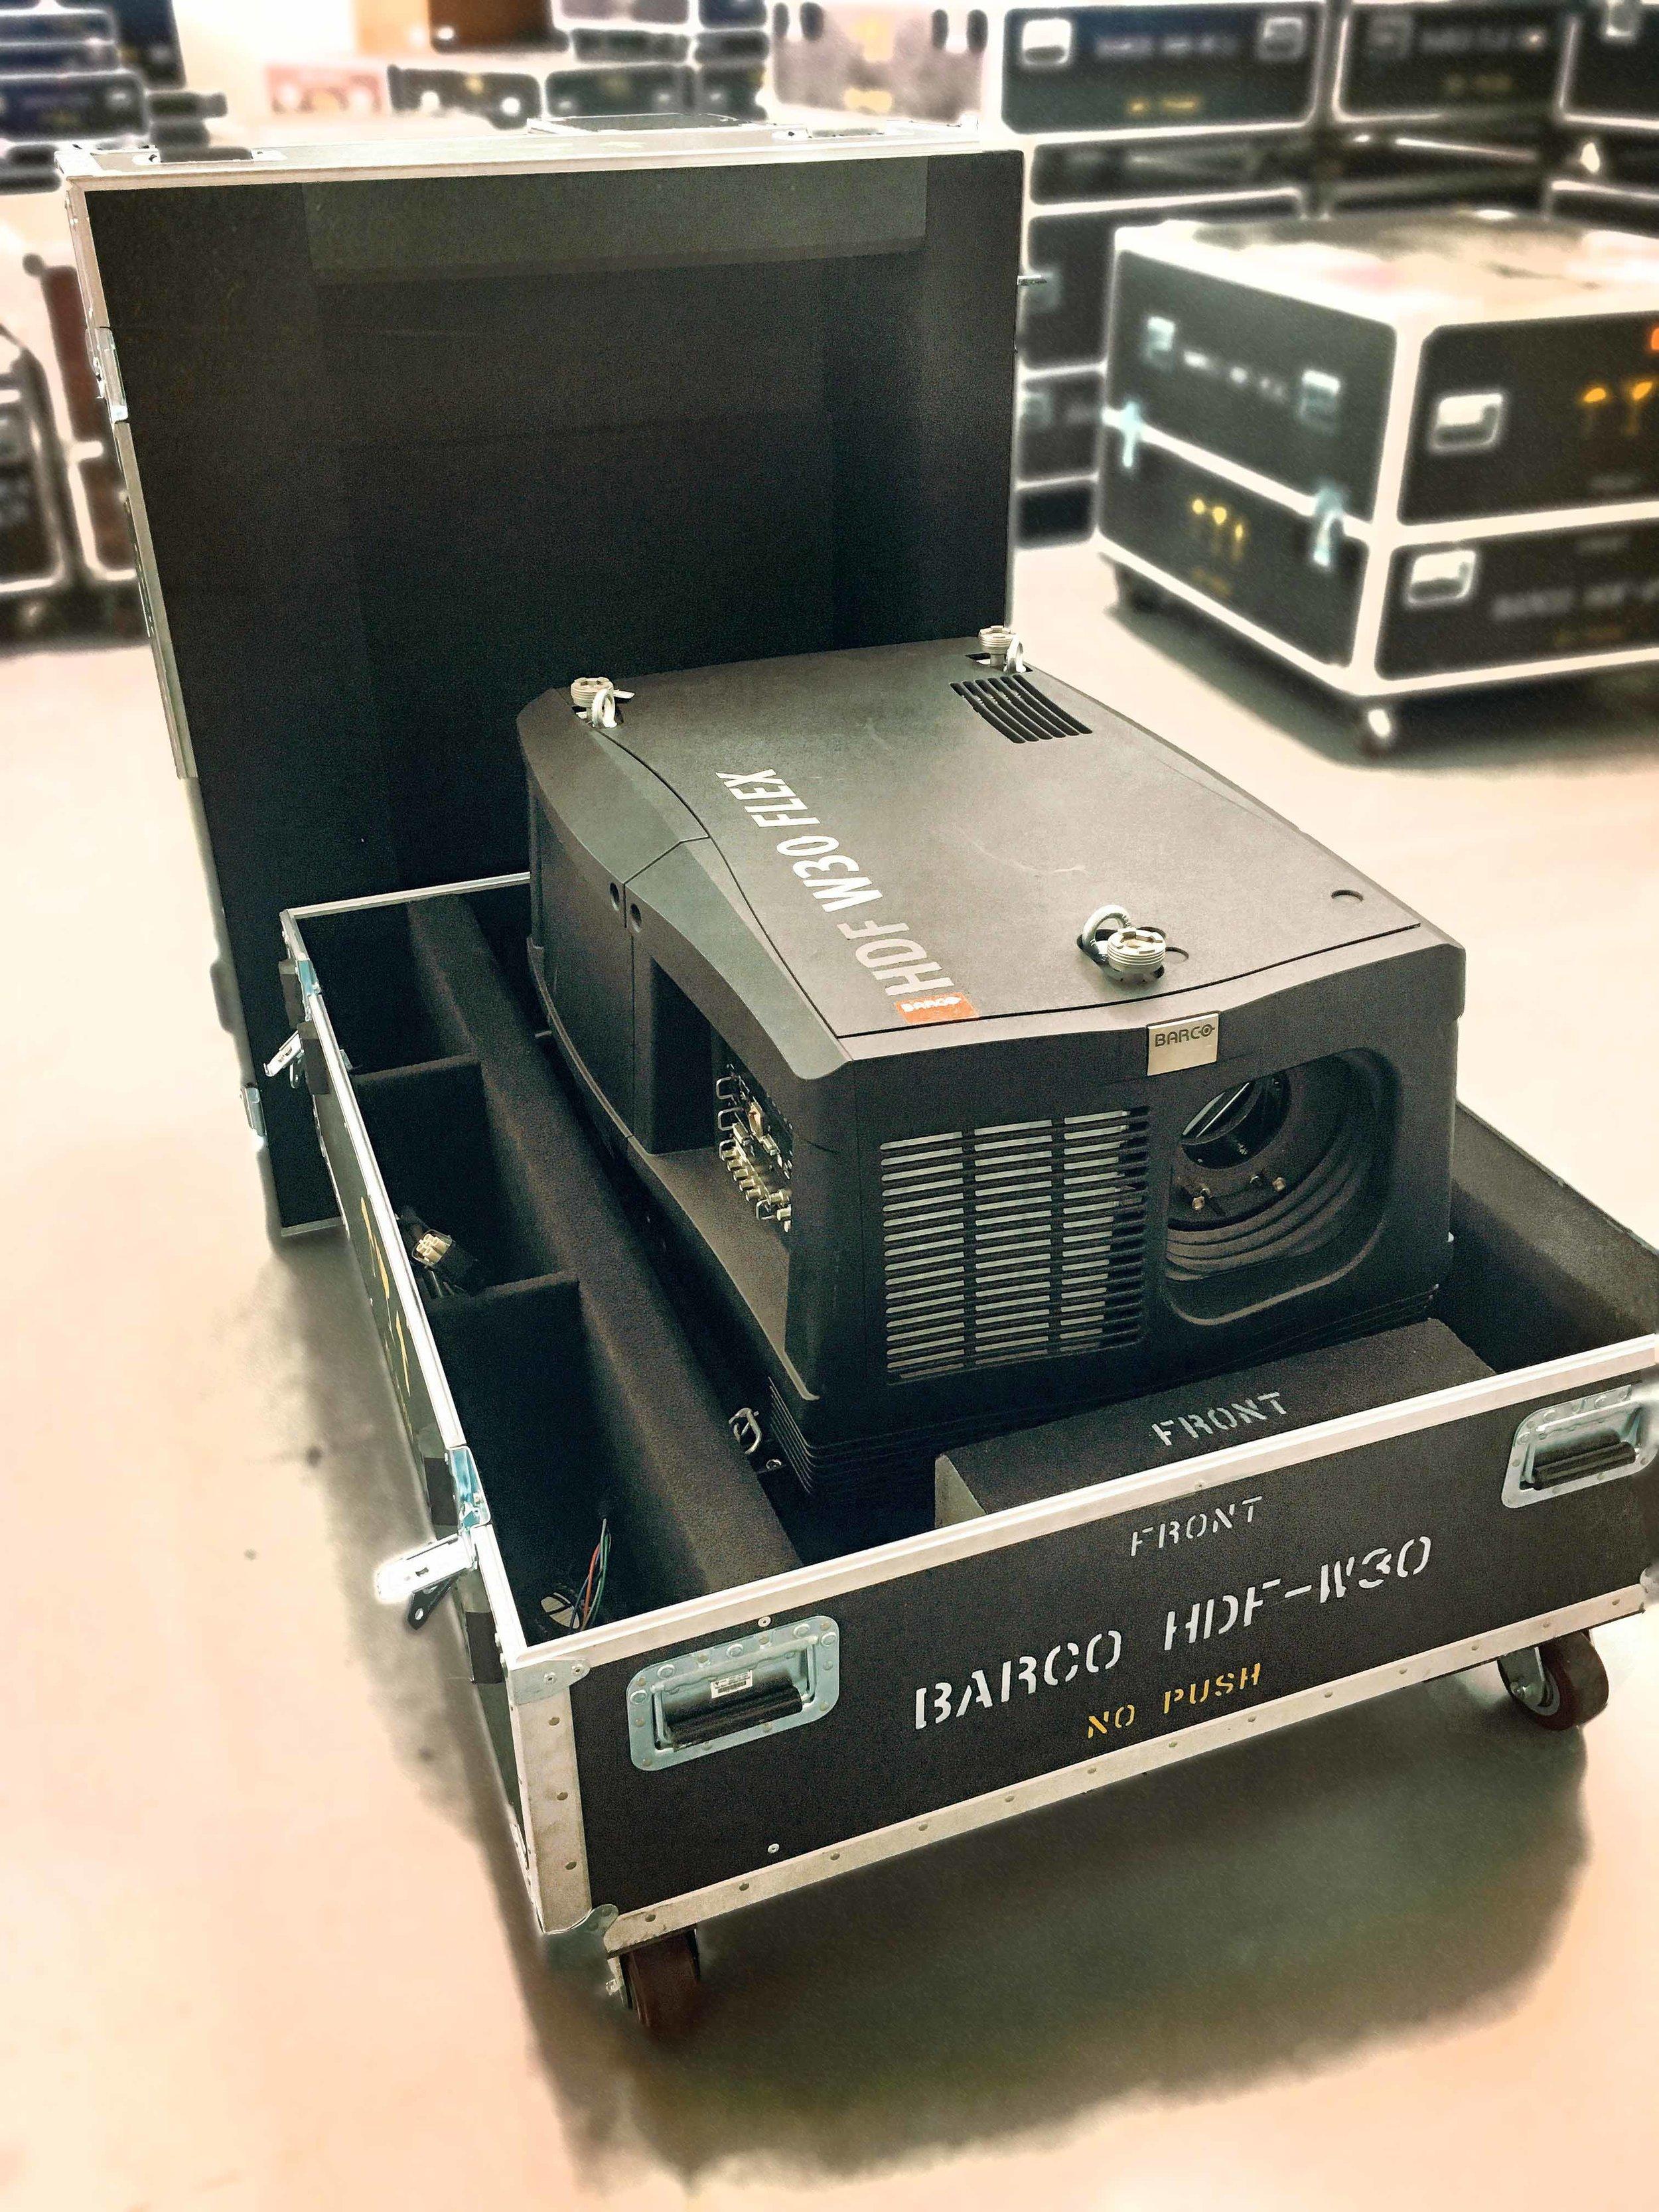 Barco HDF-W30 Projector